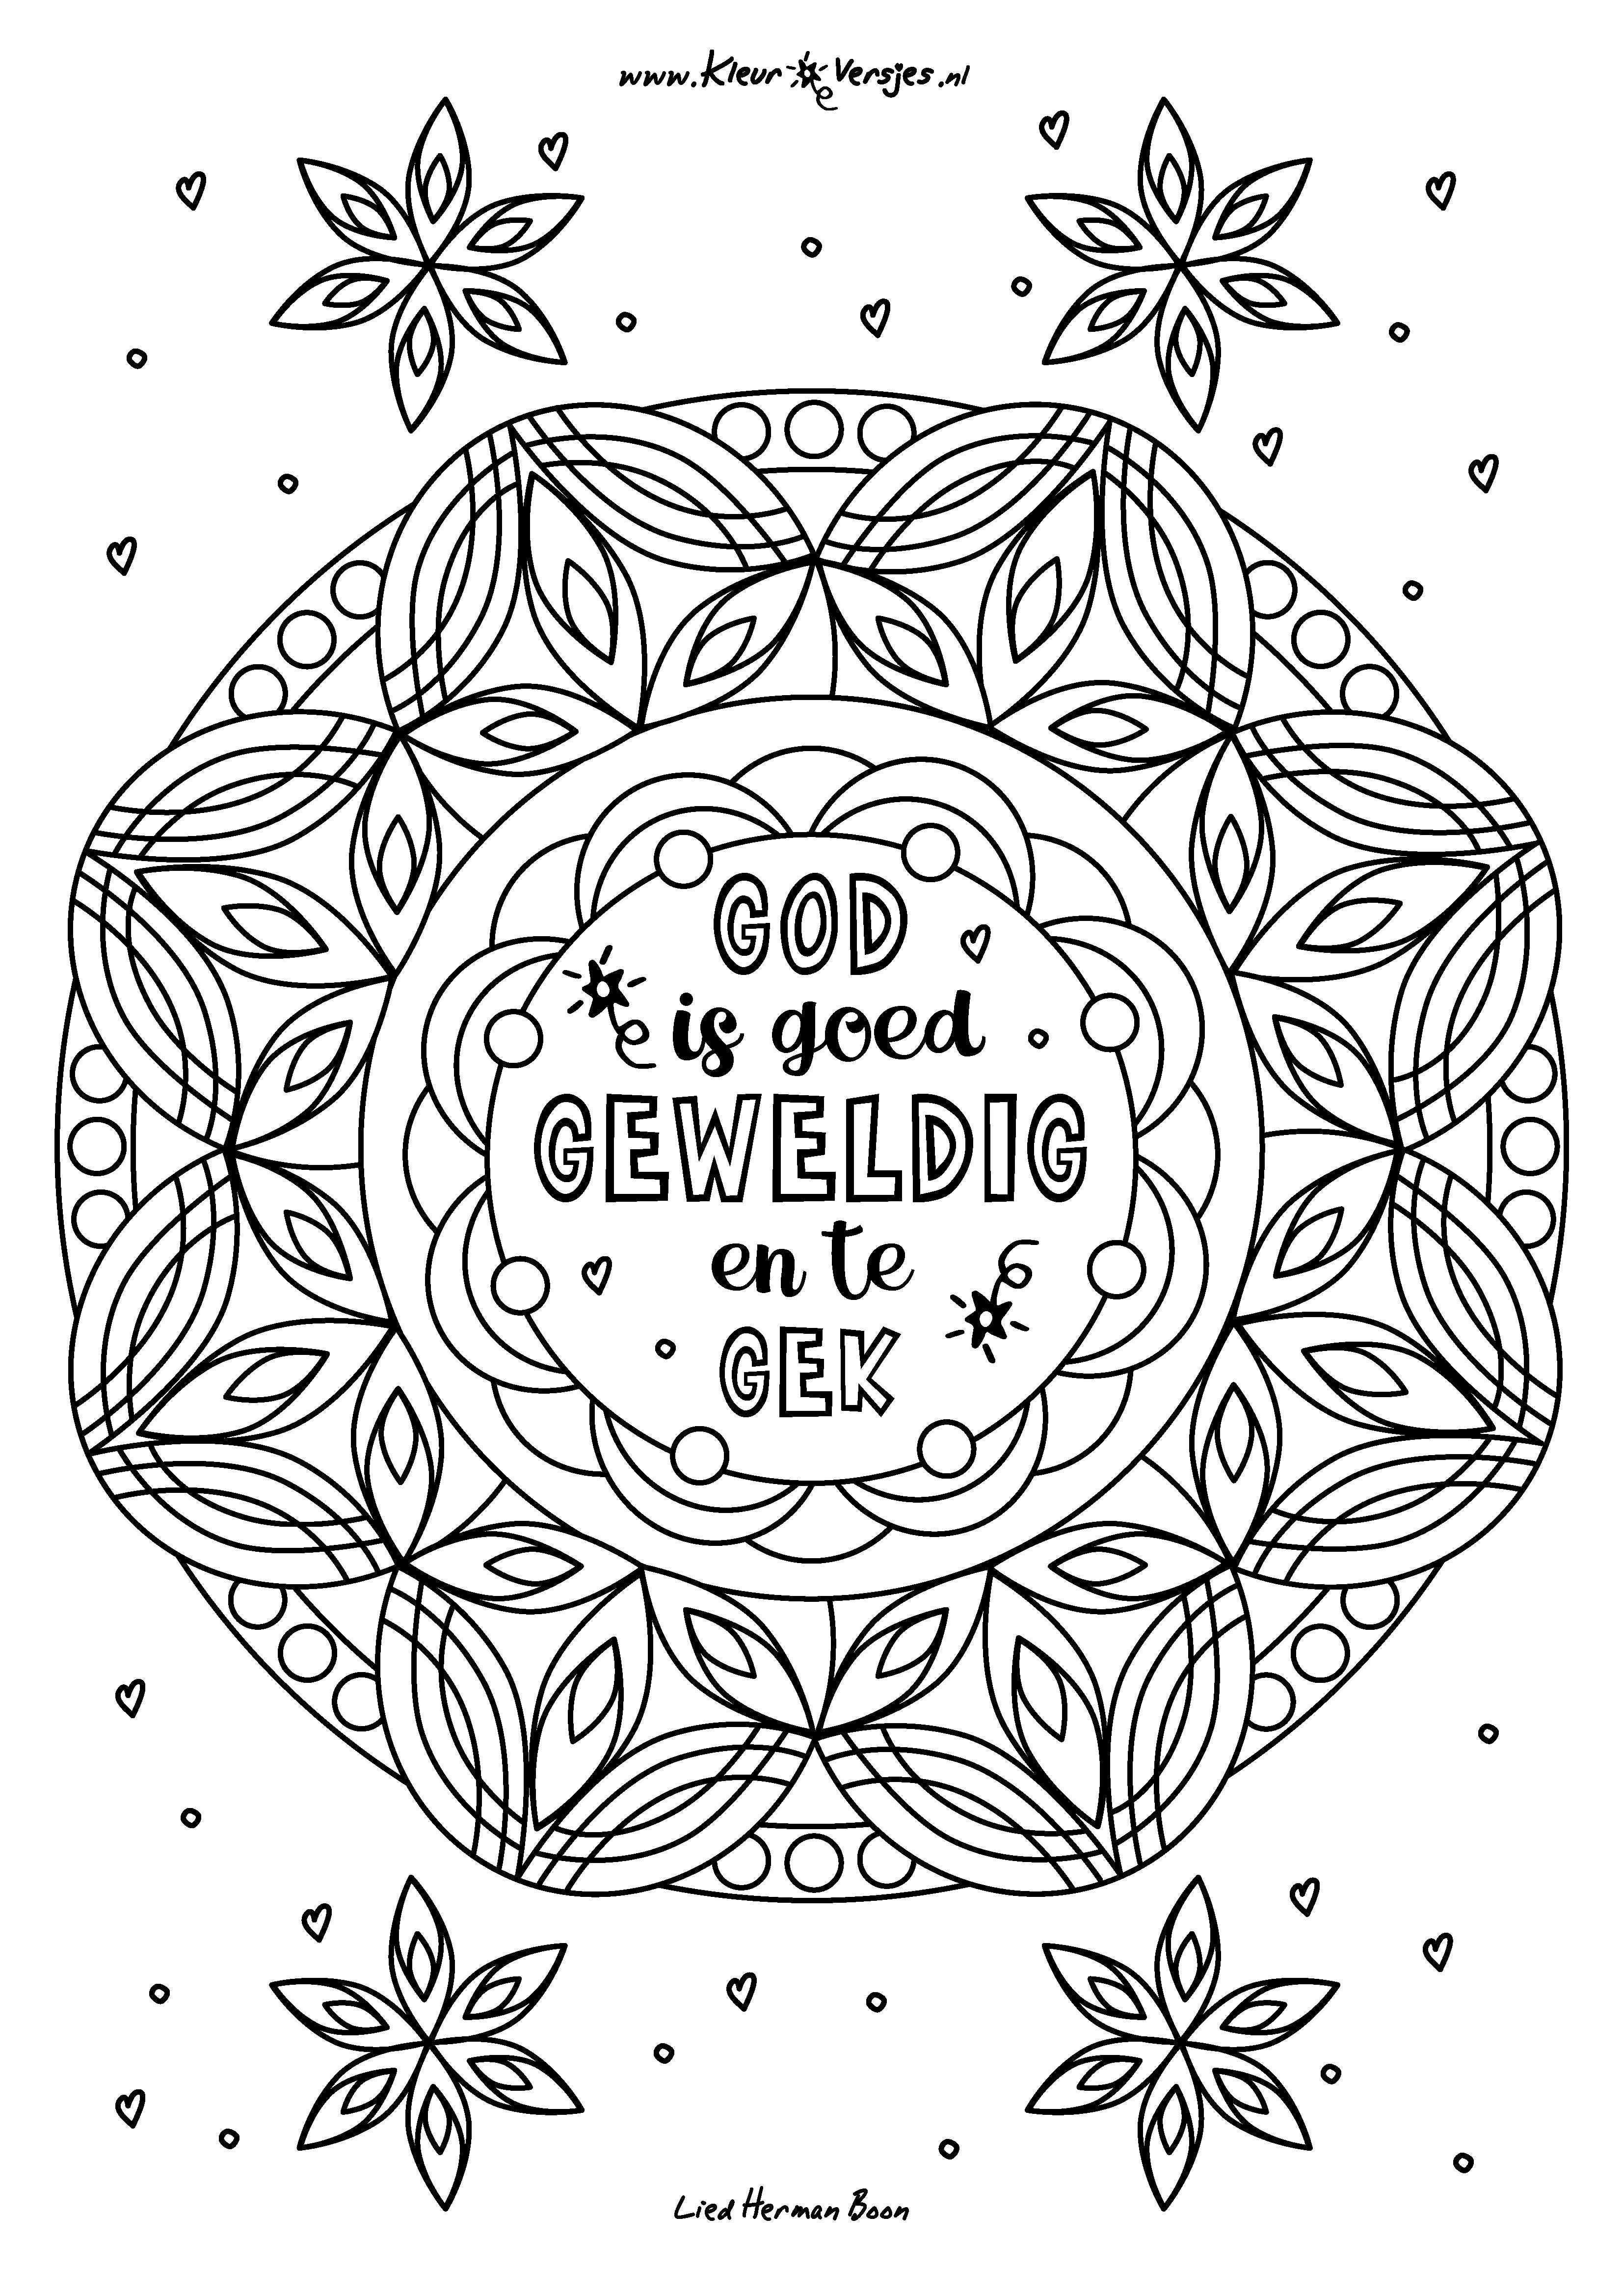 042 Kleurplaten Bijbelknutselwerk God Is Goed